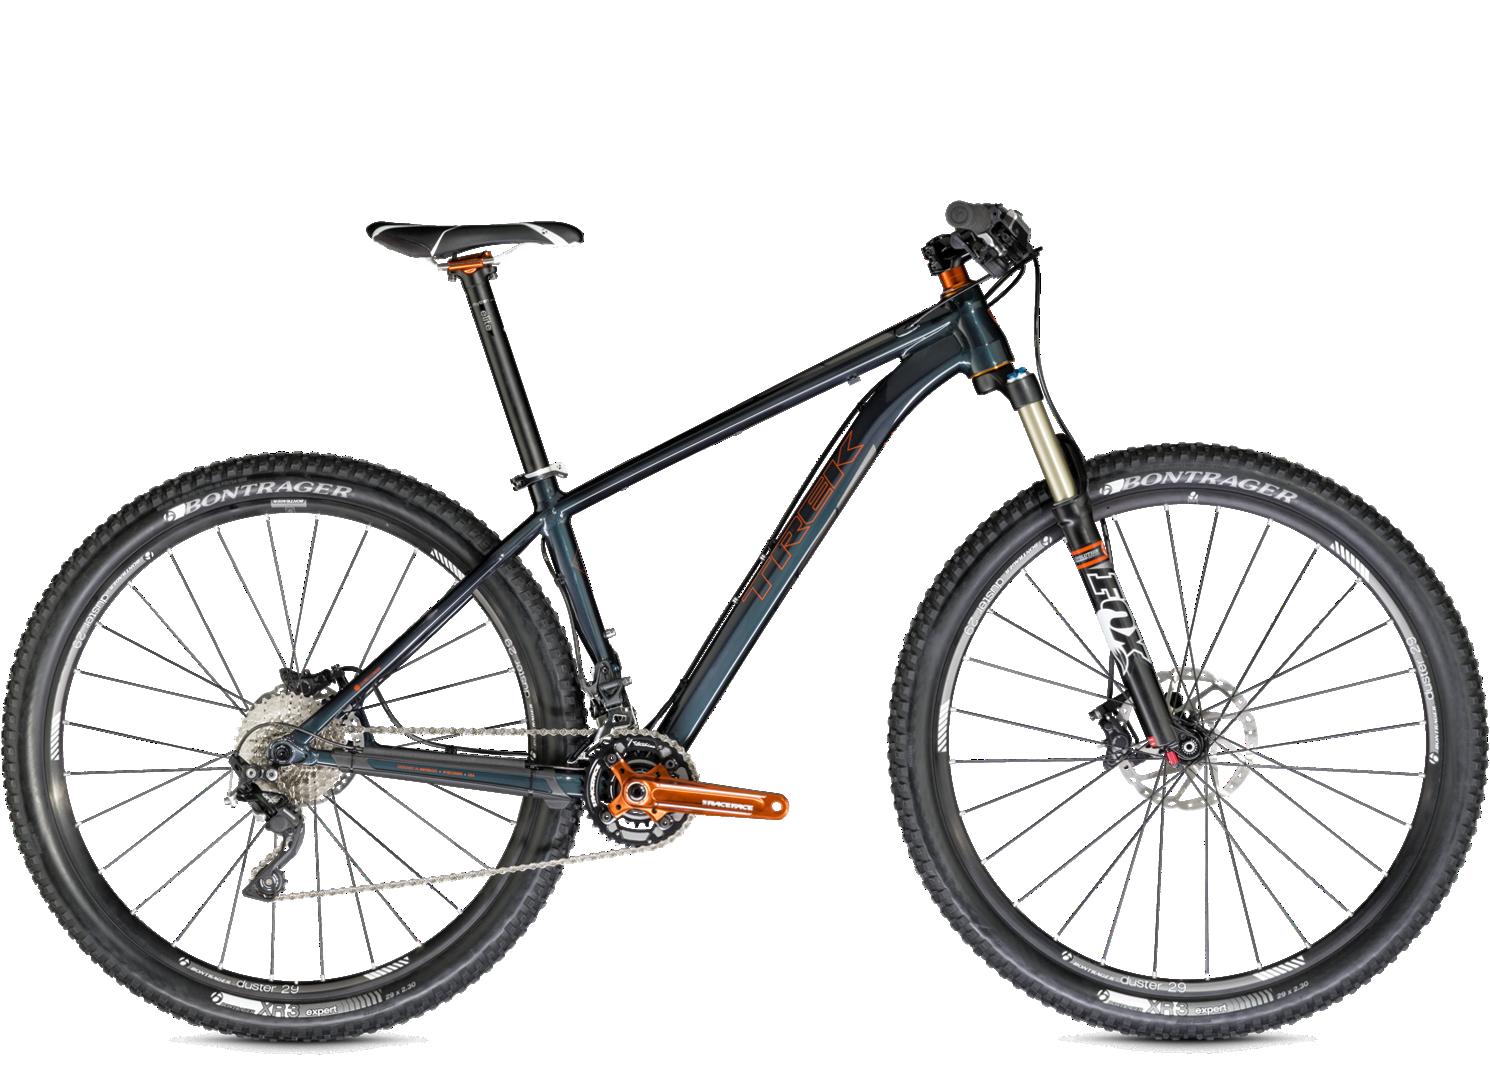 2014 Stache 8 - Bike Archive - Trek Bicycle